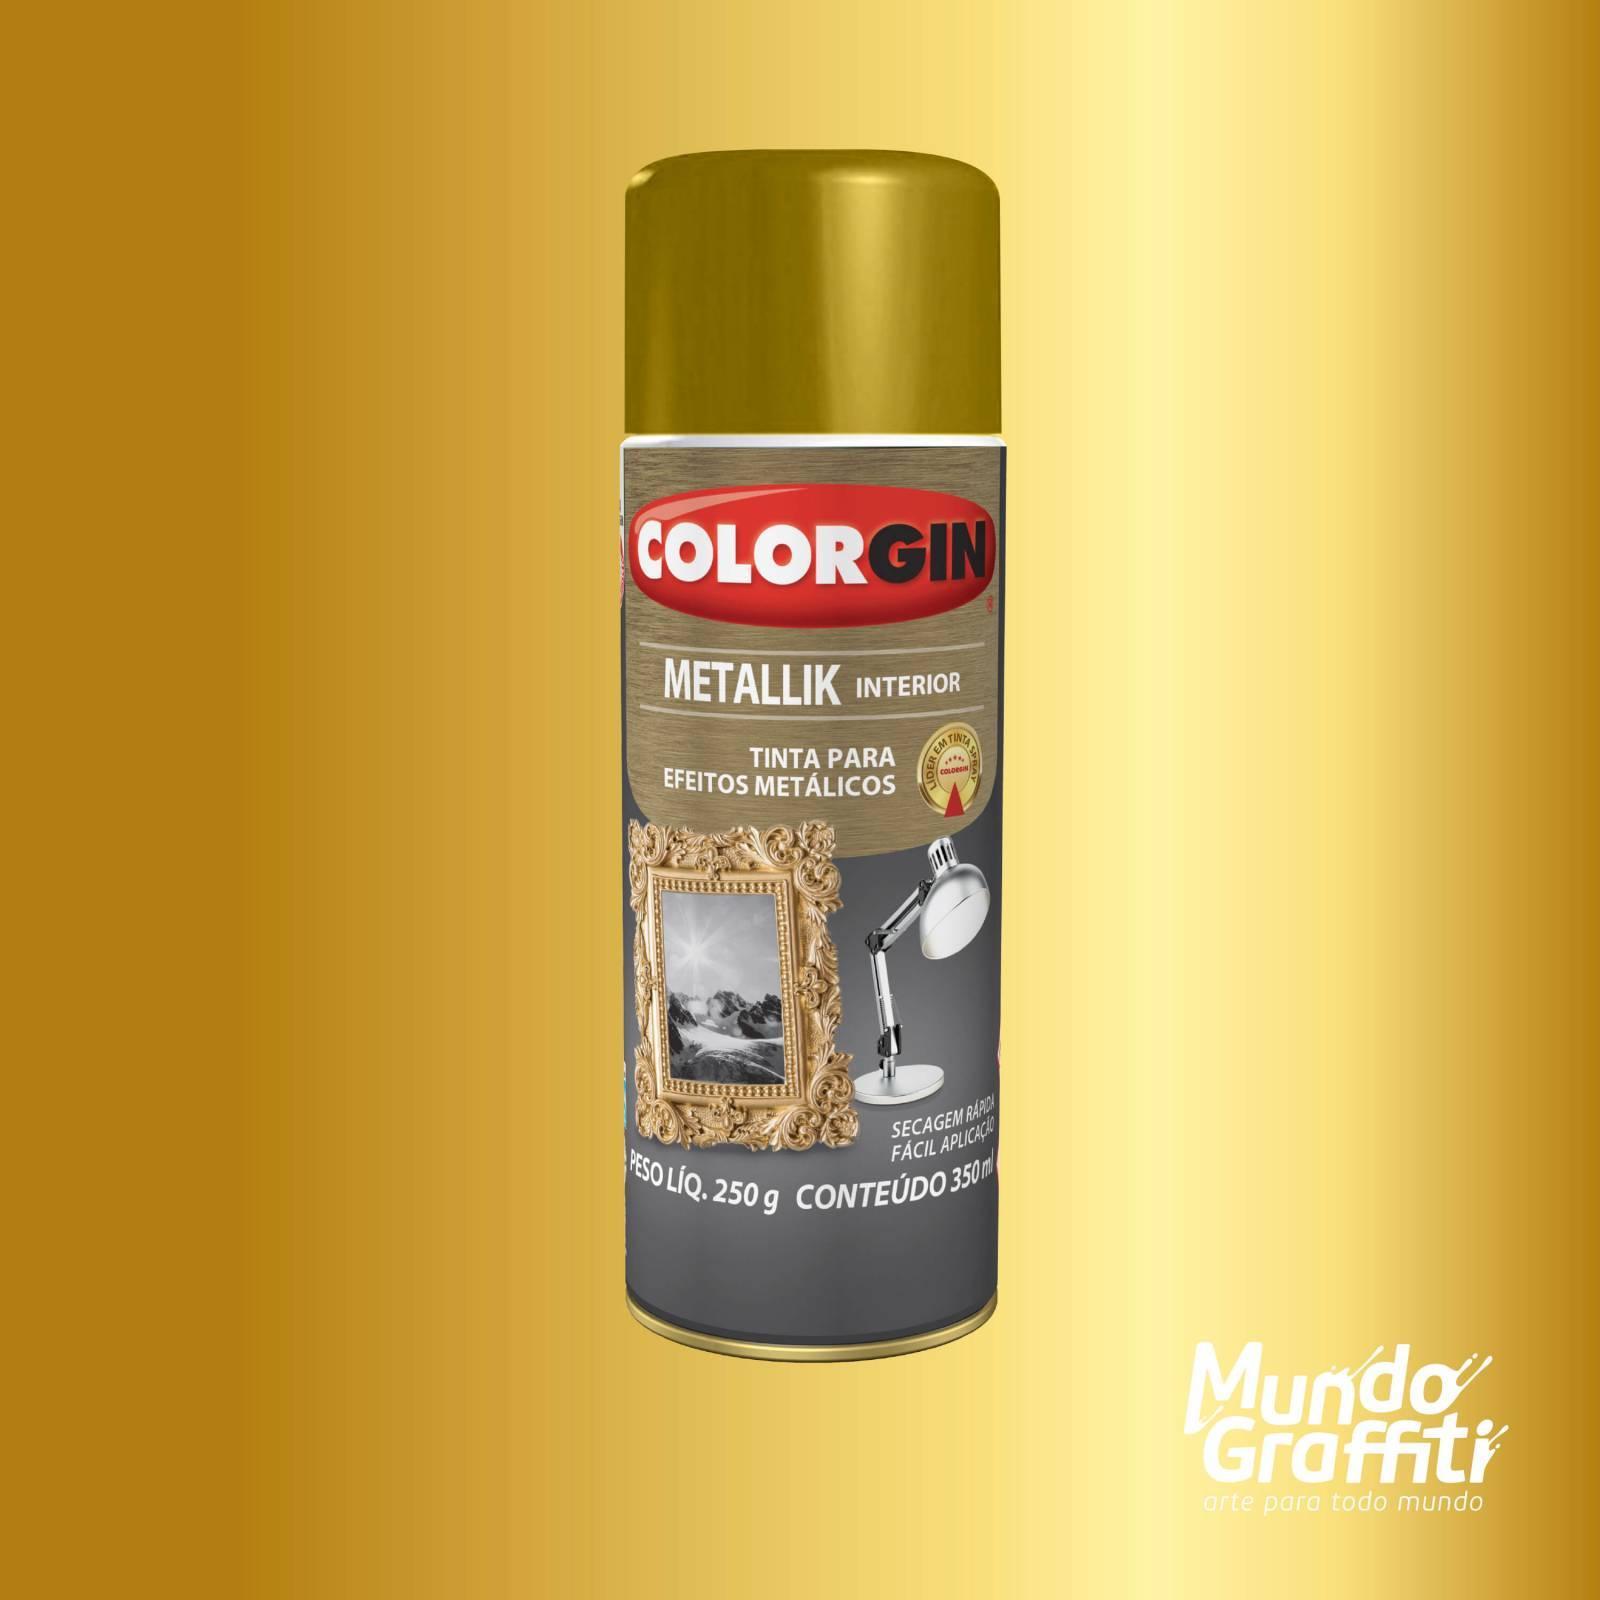 Tinta Spray Colorgin Metallik 052 Ouro 350ml - Mundo Graffiti